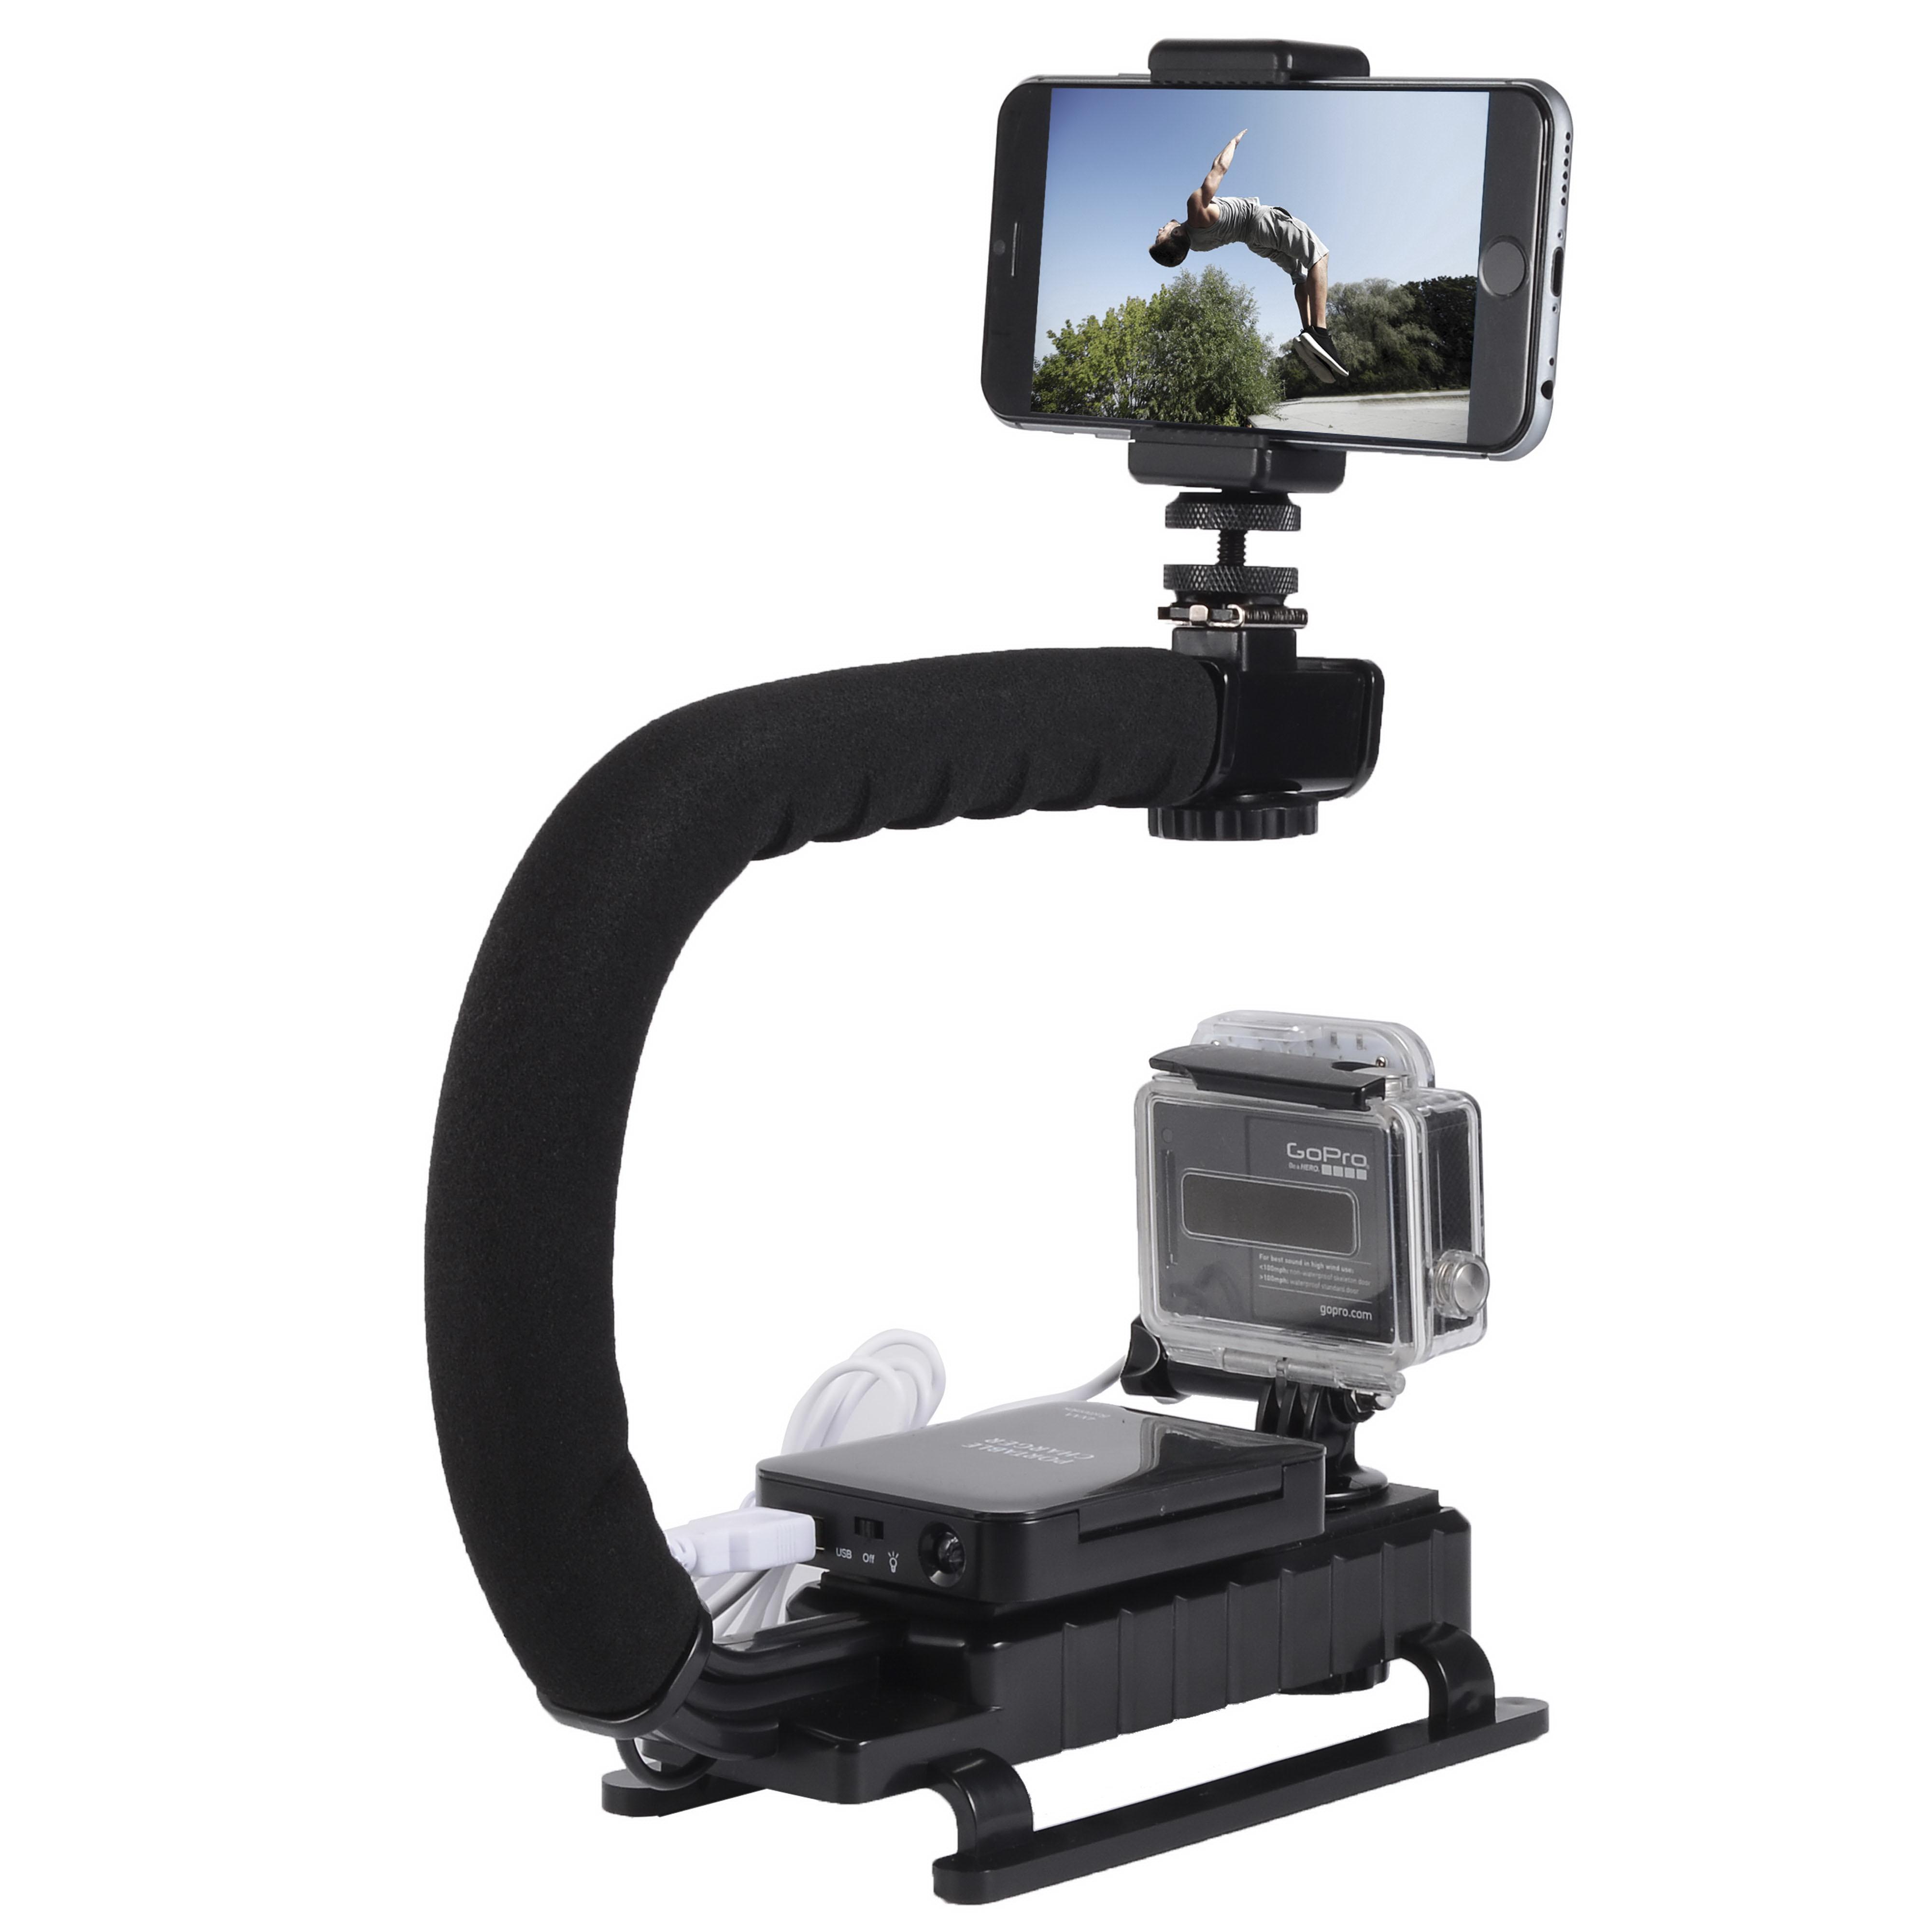 Camera Camcorder Stabilizing Stabilizer Handle Hand Grip + LED Flash for DSLR DV Flash LED OS476(China (Mainland))